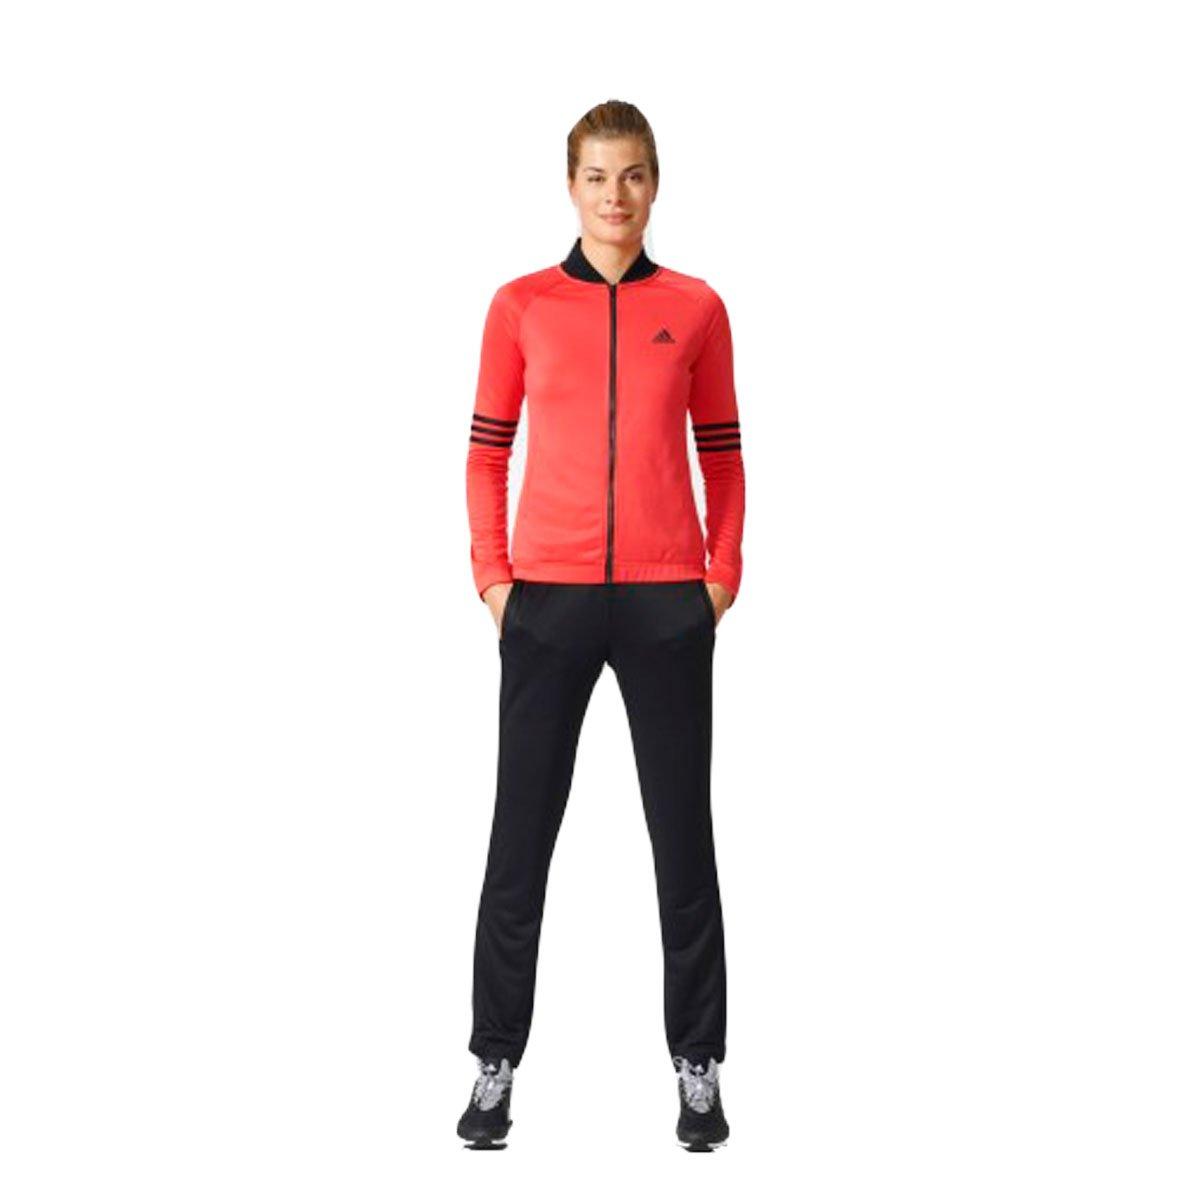 5a6e60091b4 Bizz Store - Agasalho Feminino Adidas Cosy Rosa Preto